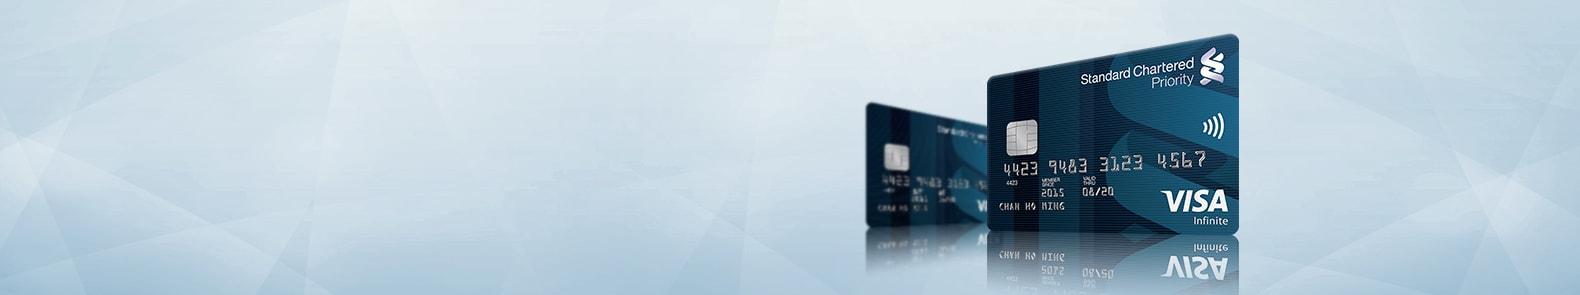 Hk credit cards priority banking masthead v